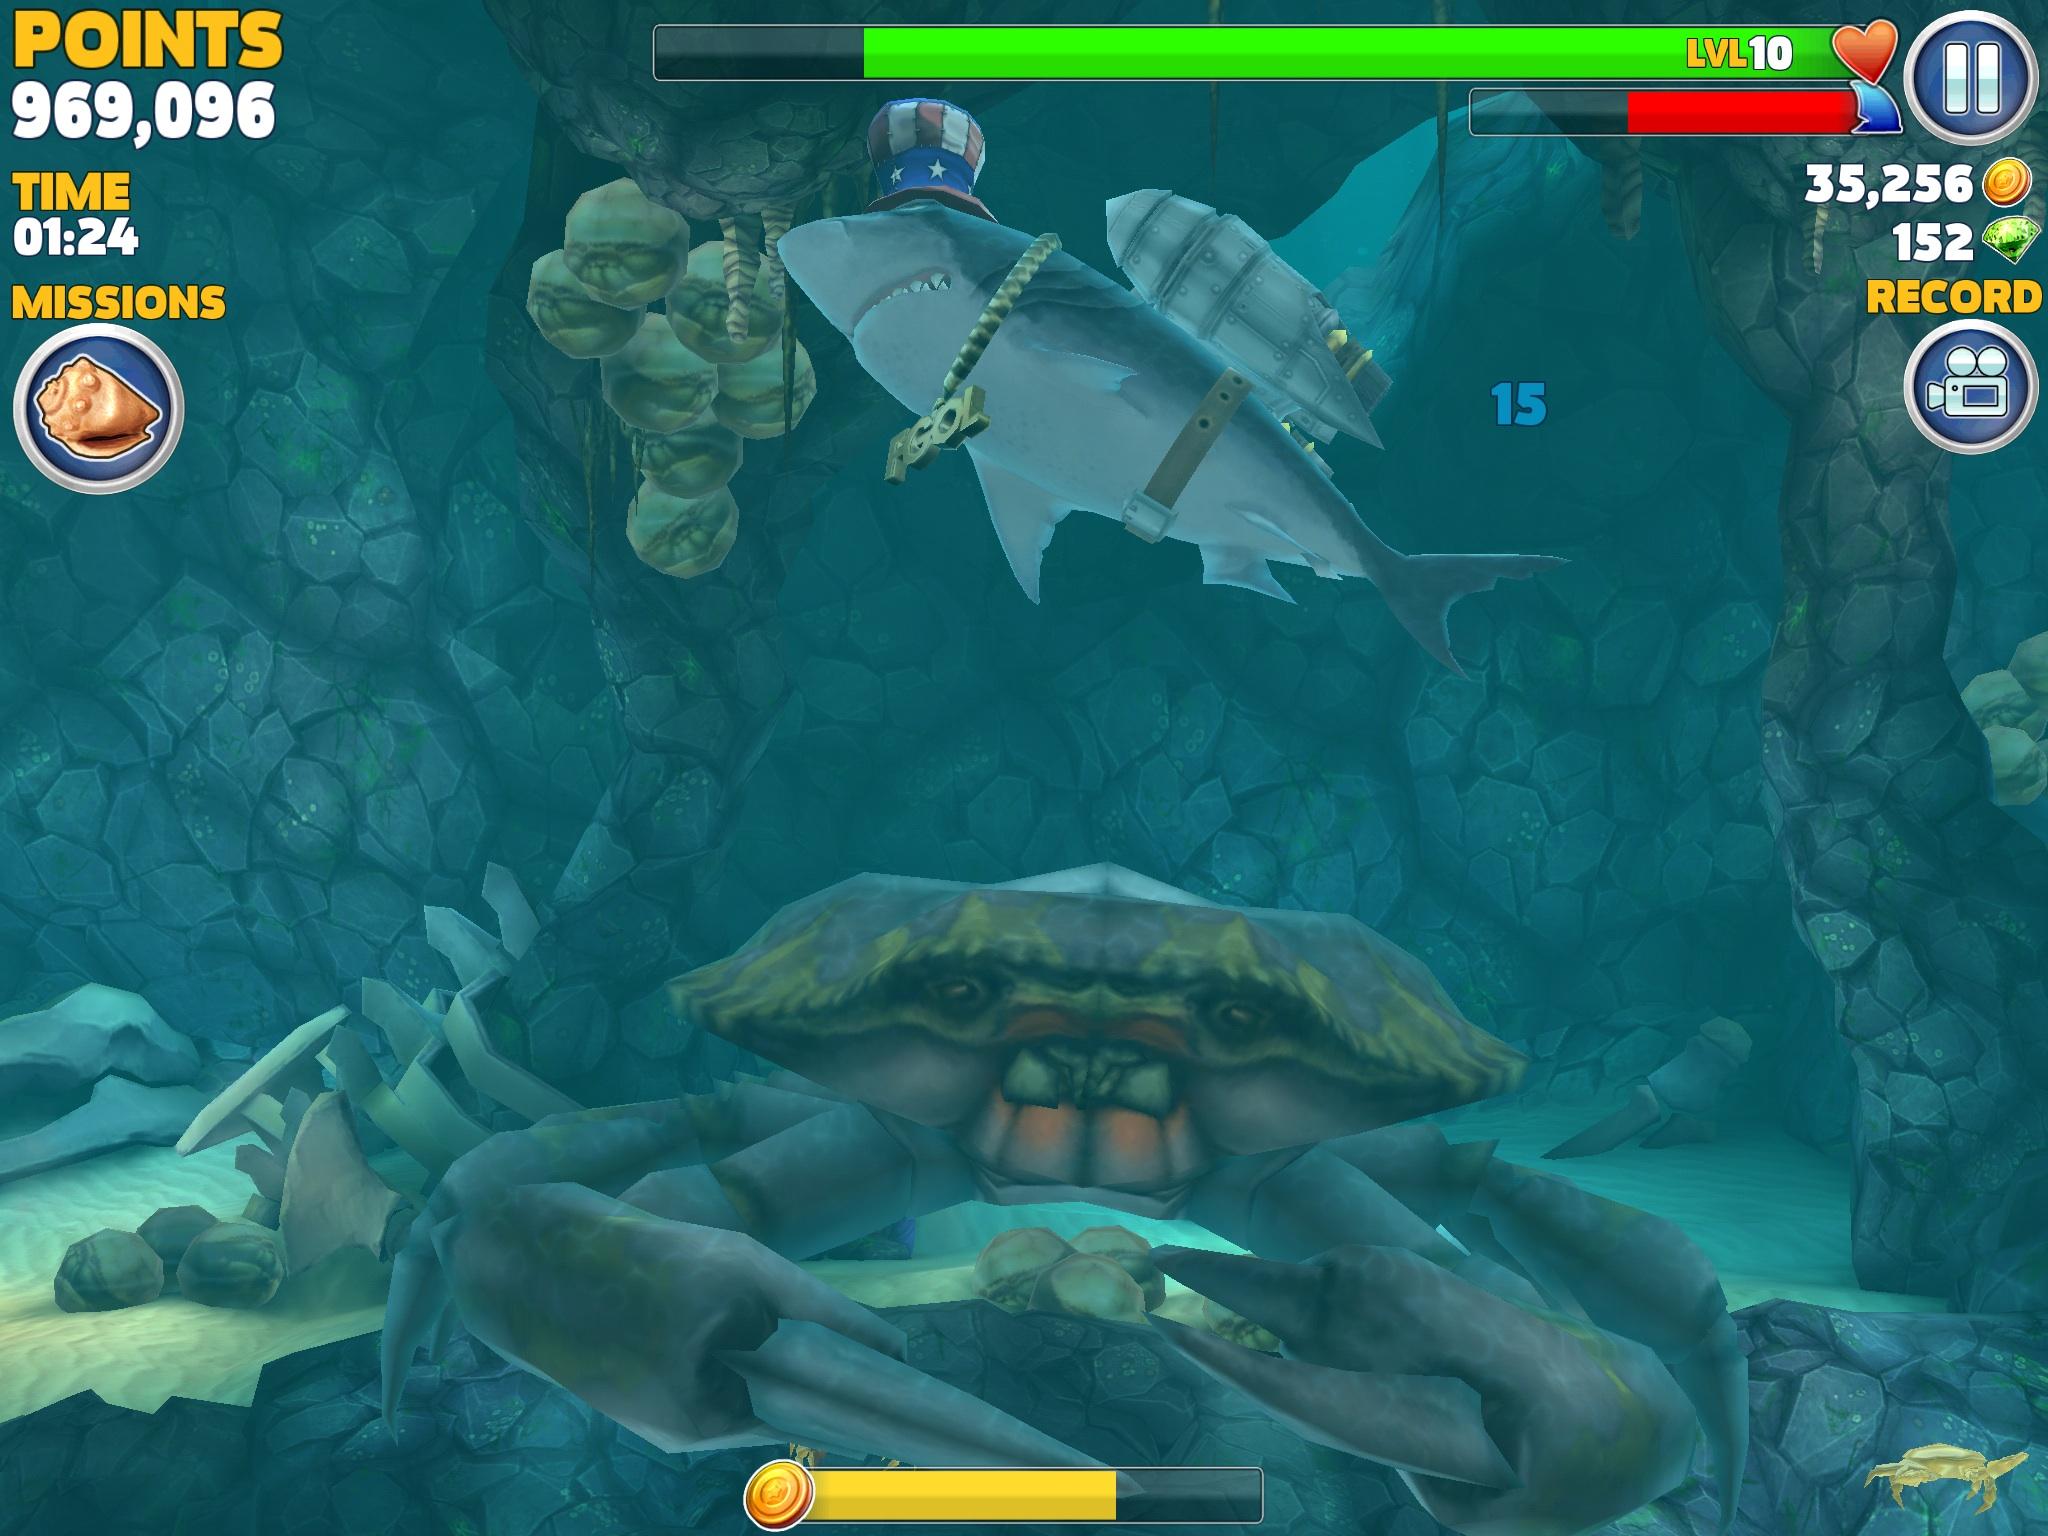 Hungry shark evolution megalodon vs giant crab - photo#7